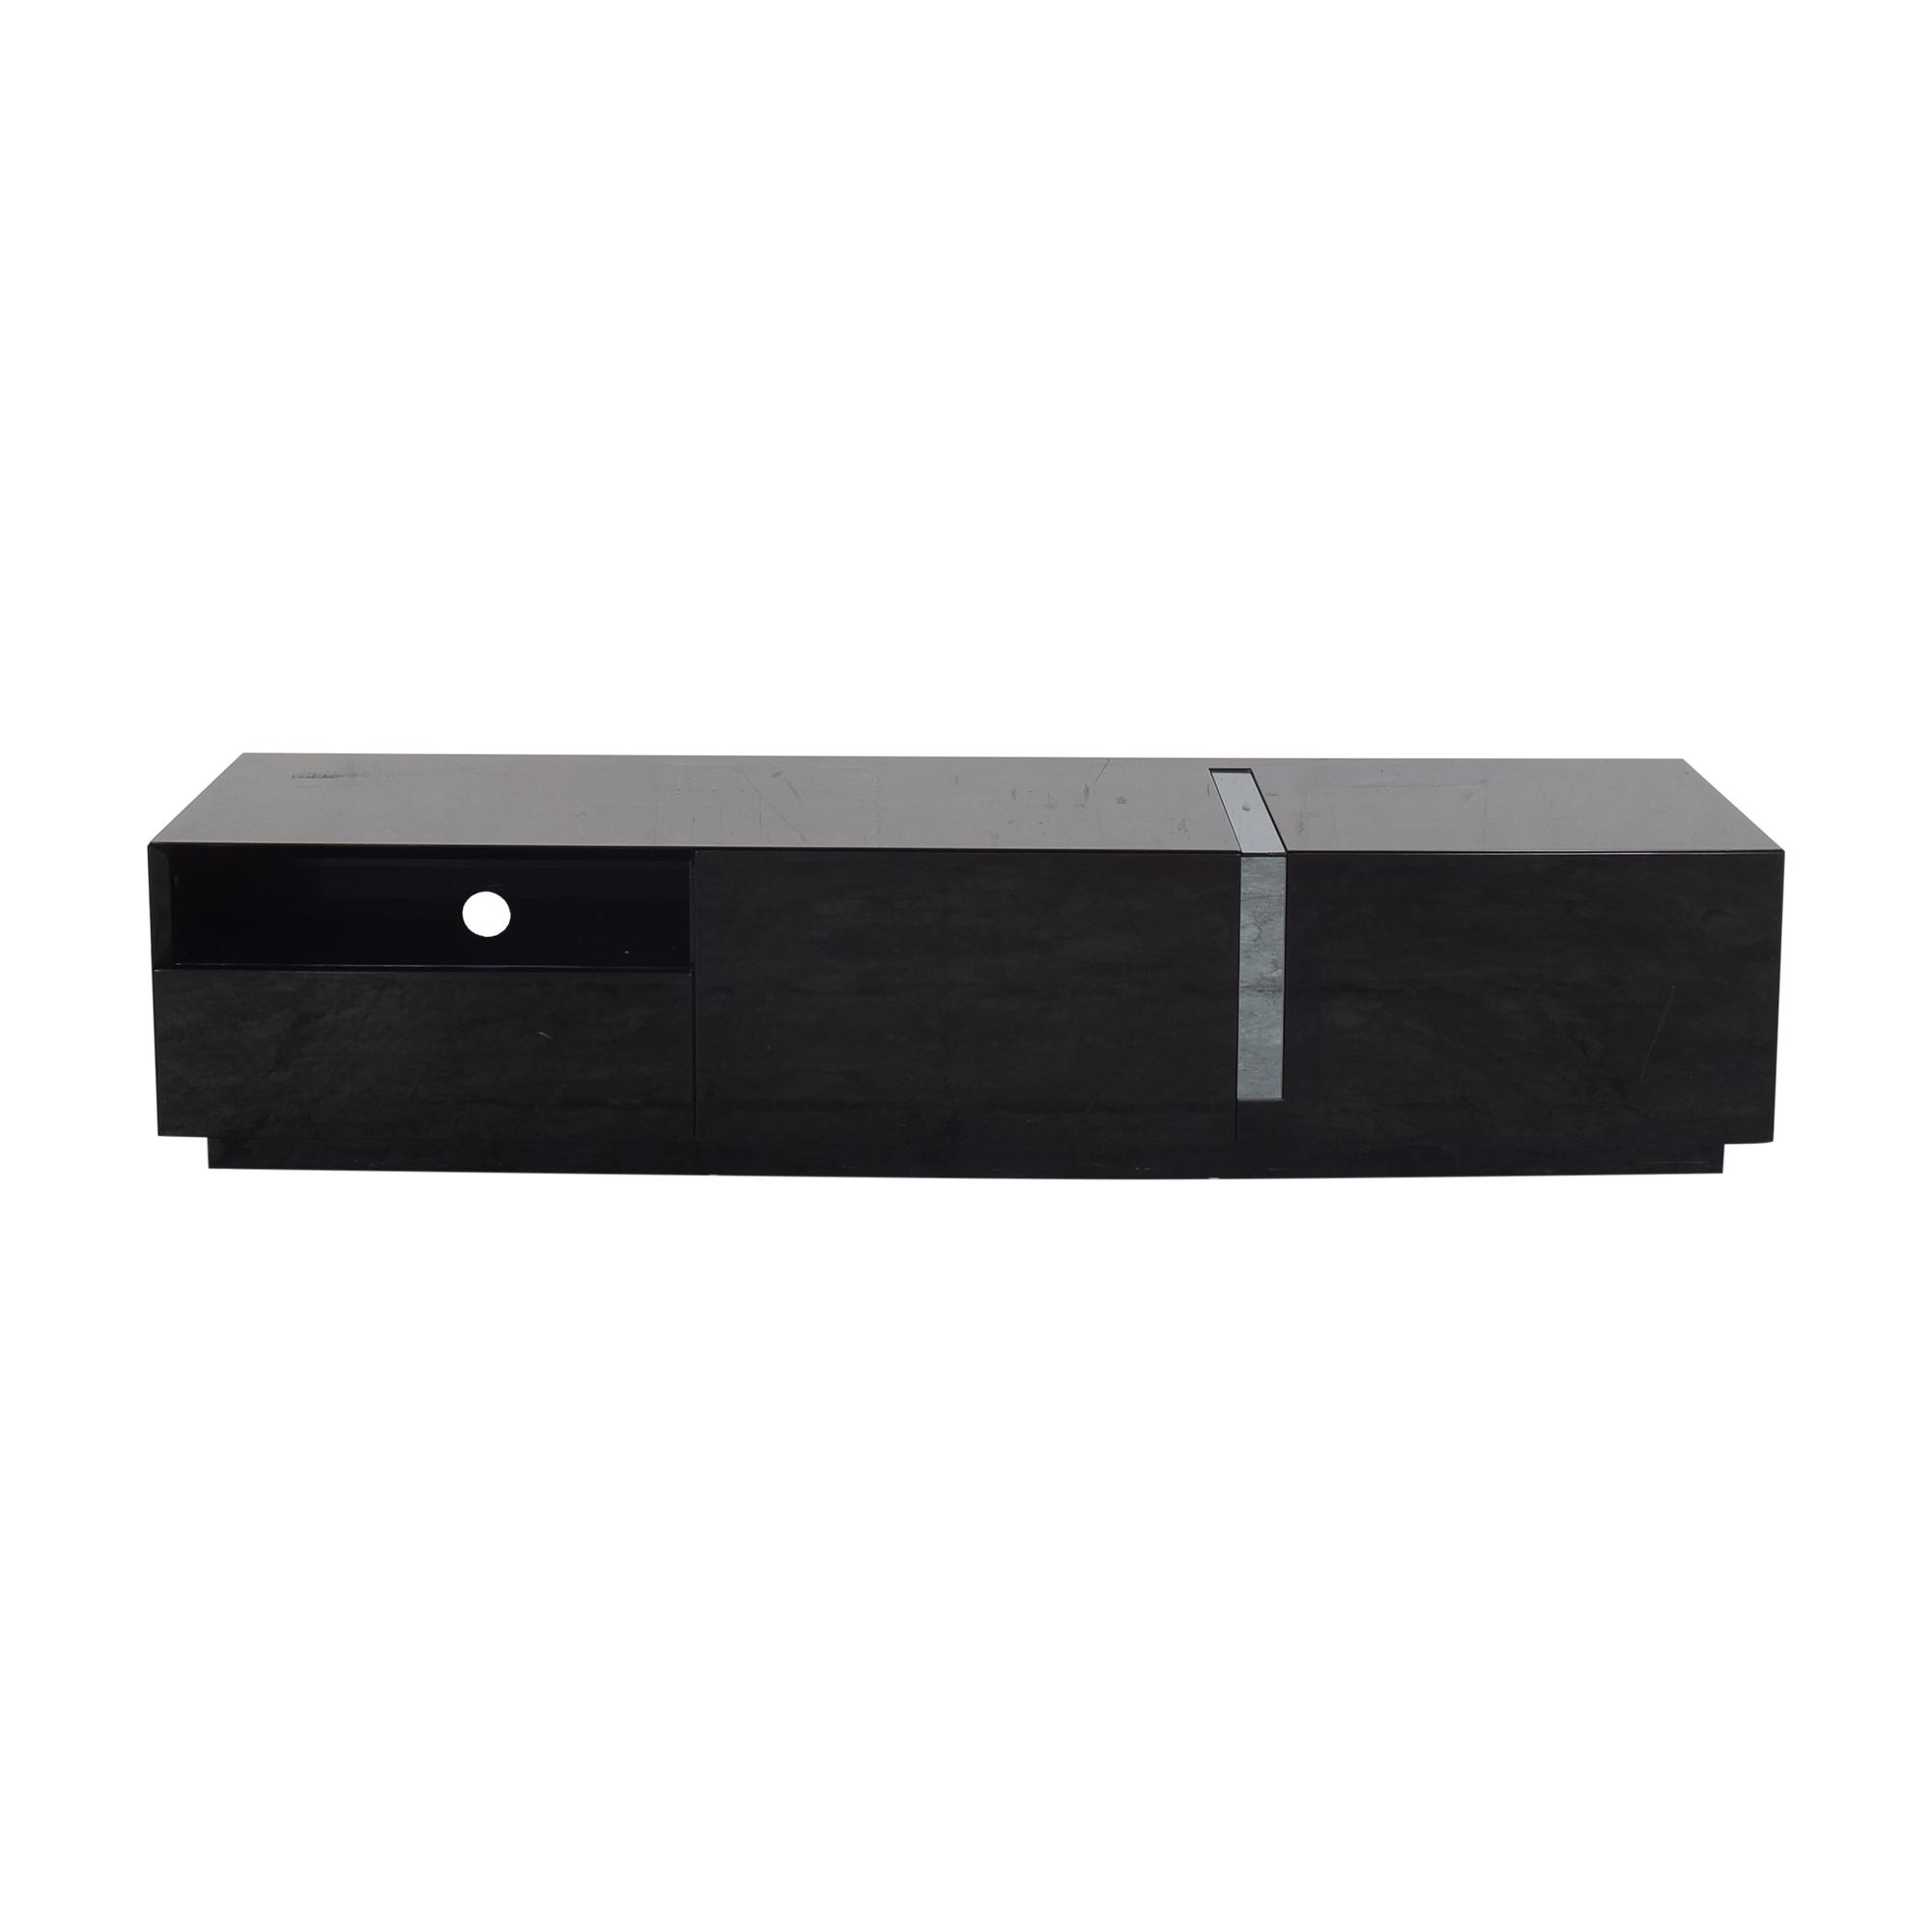 J&M Furniture J&M Furniture Modern TV Stand price